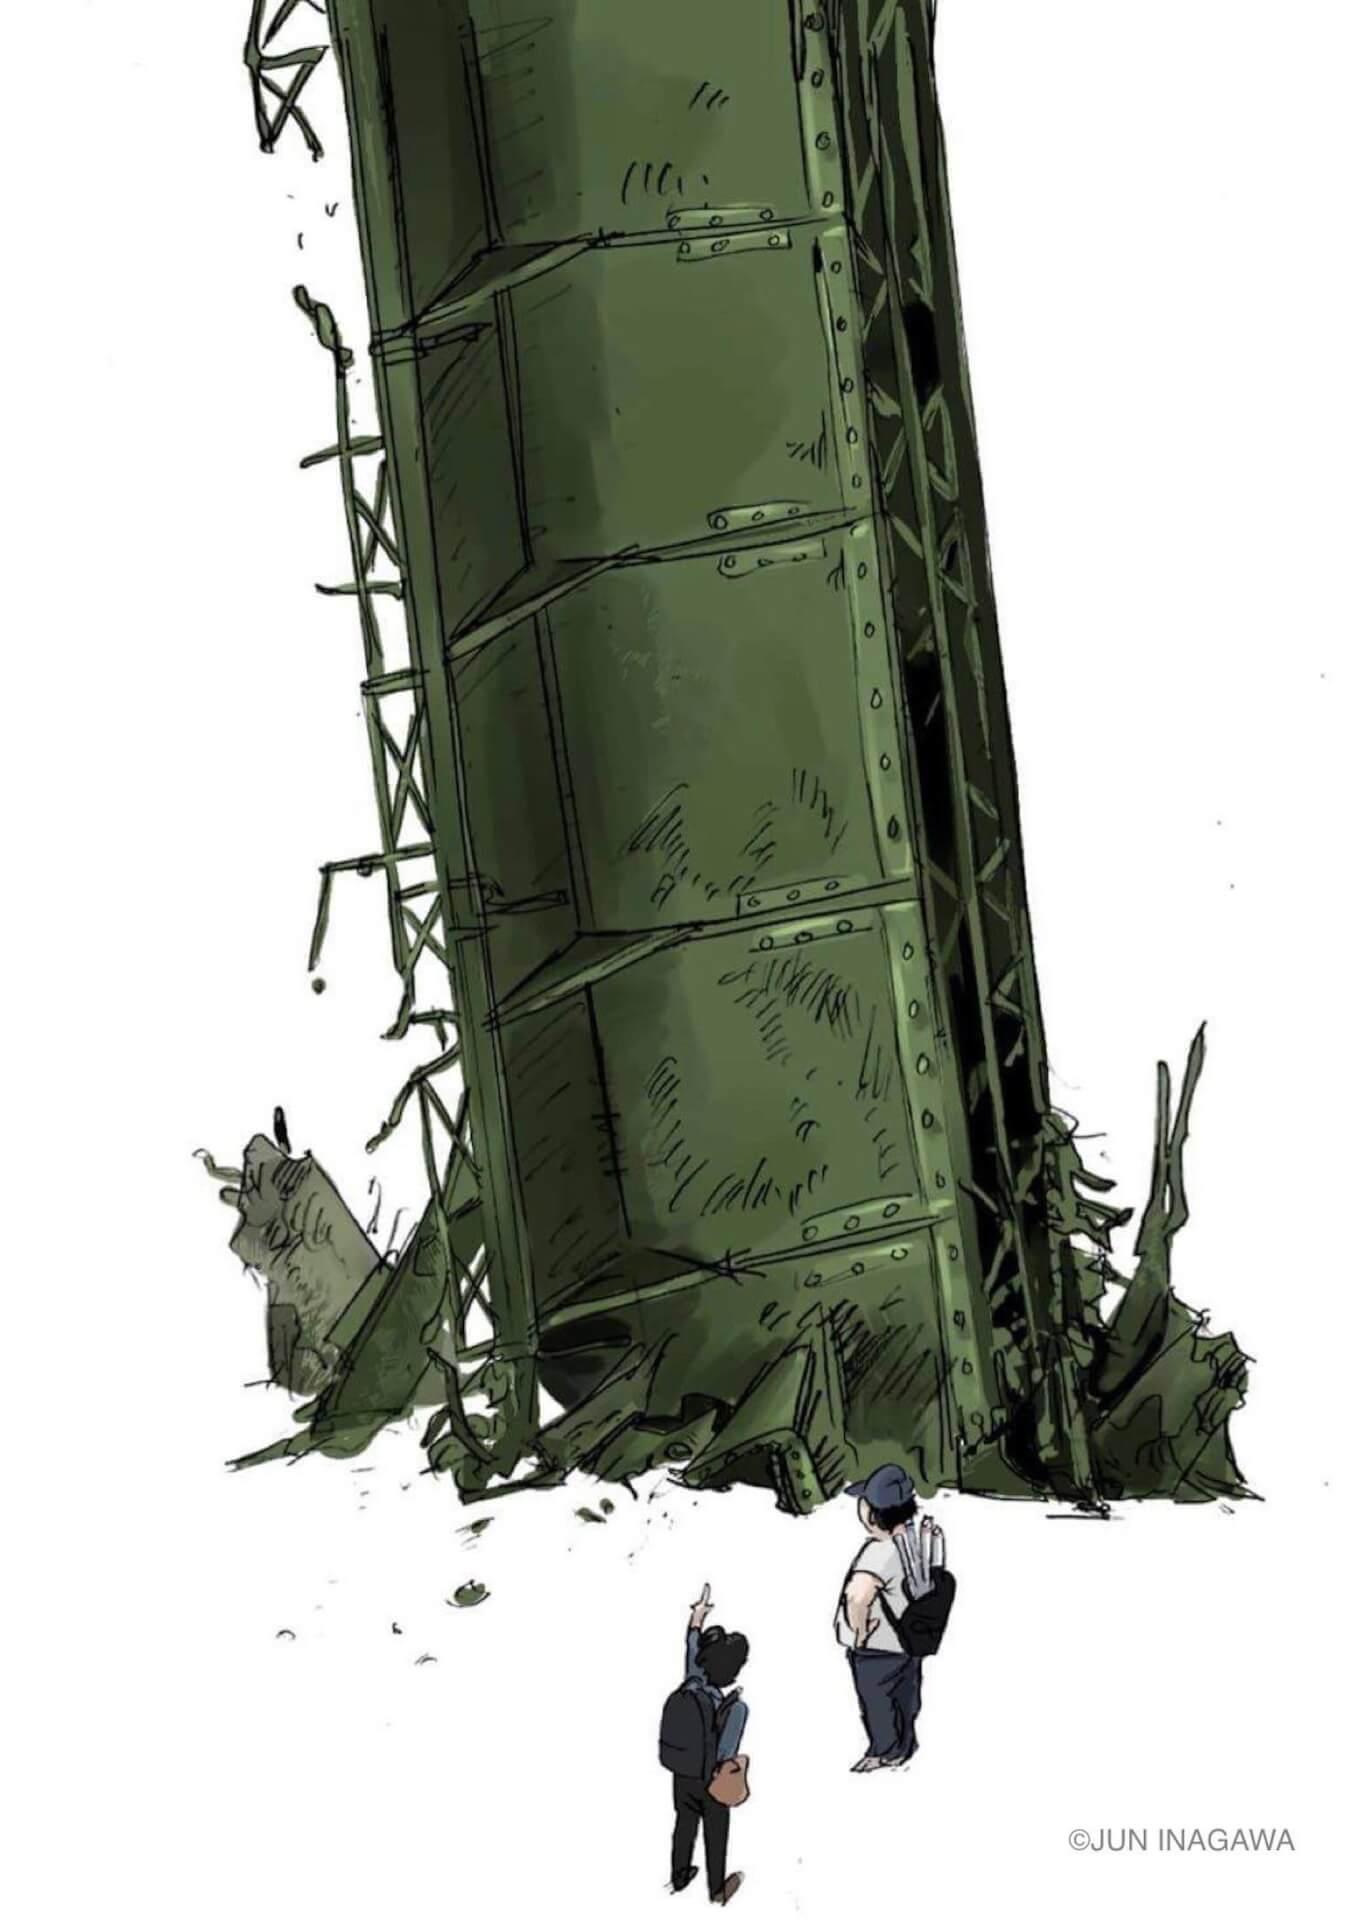 JUN INAGAWAの初作品集『情報破壊 マスメディアクラッシュ』がSHIBUYA TSUTAYAにて発売決定! art210423_juninagawa-210423_6